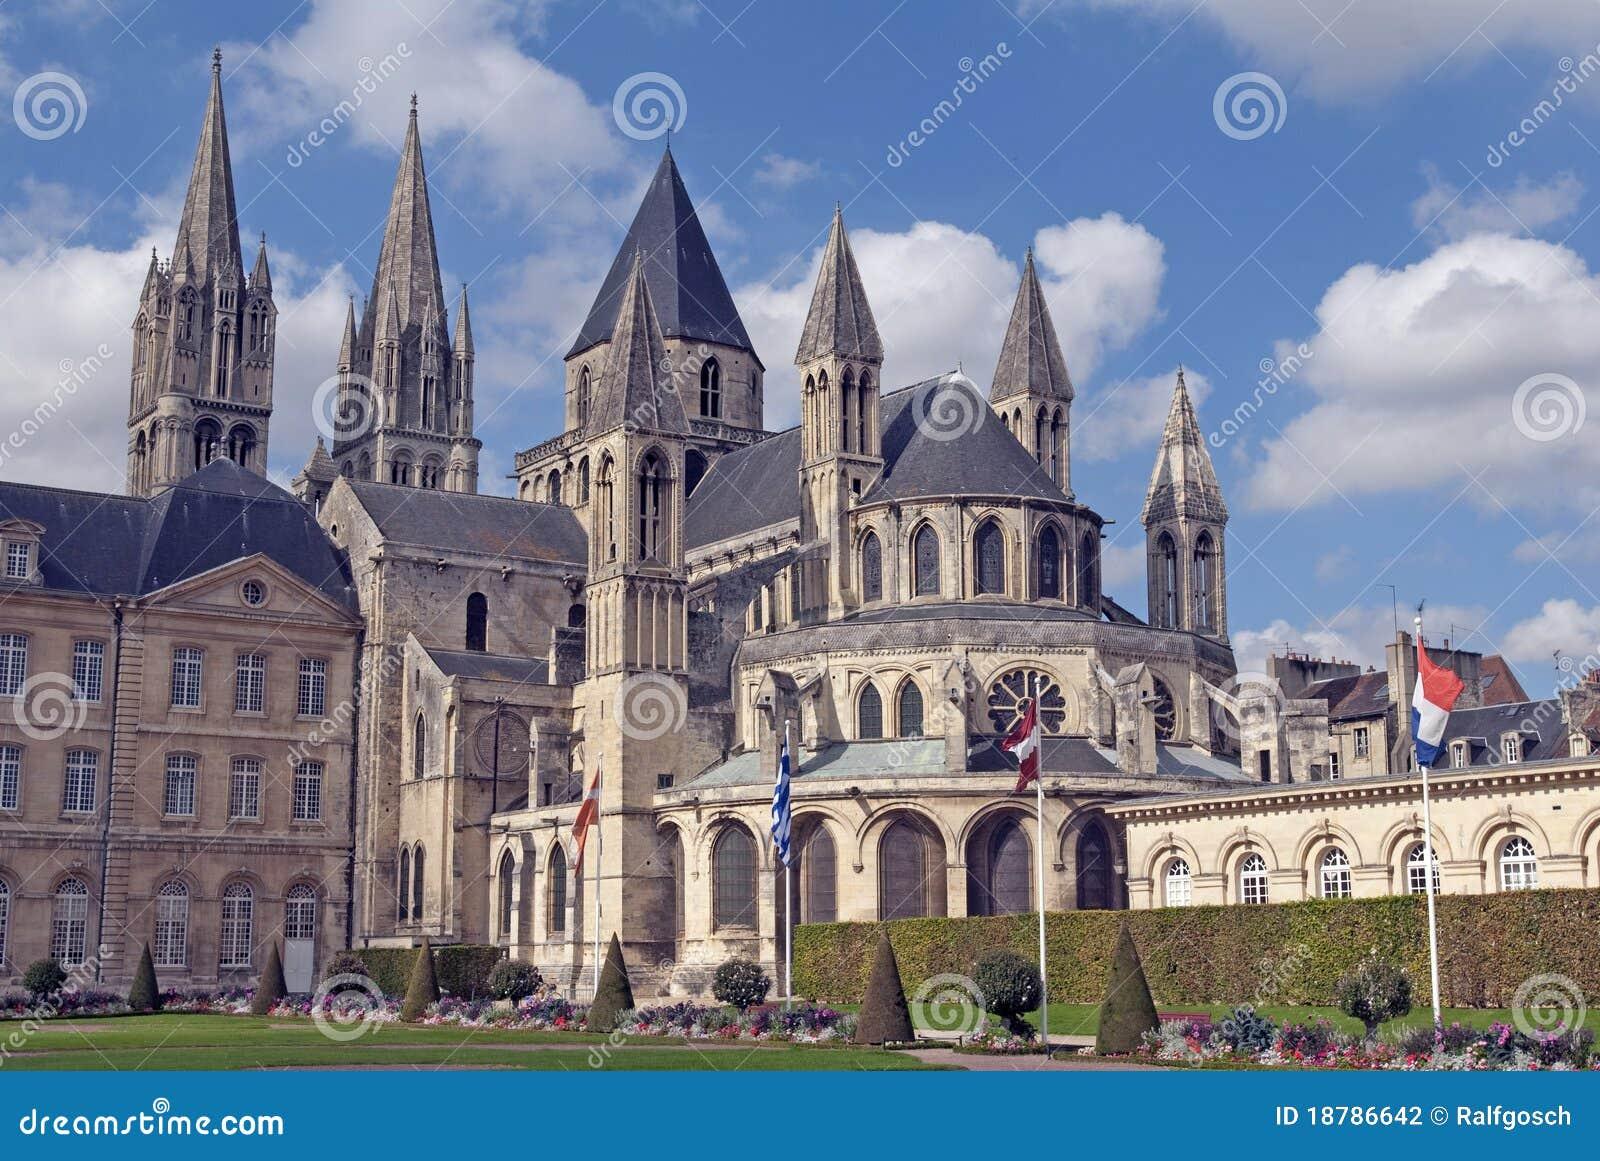 st etienne de caen stock photo image of cathedral france 18786642. Black Bedroom Furniture Sets. Home Design Ideas